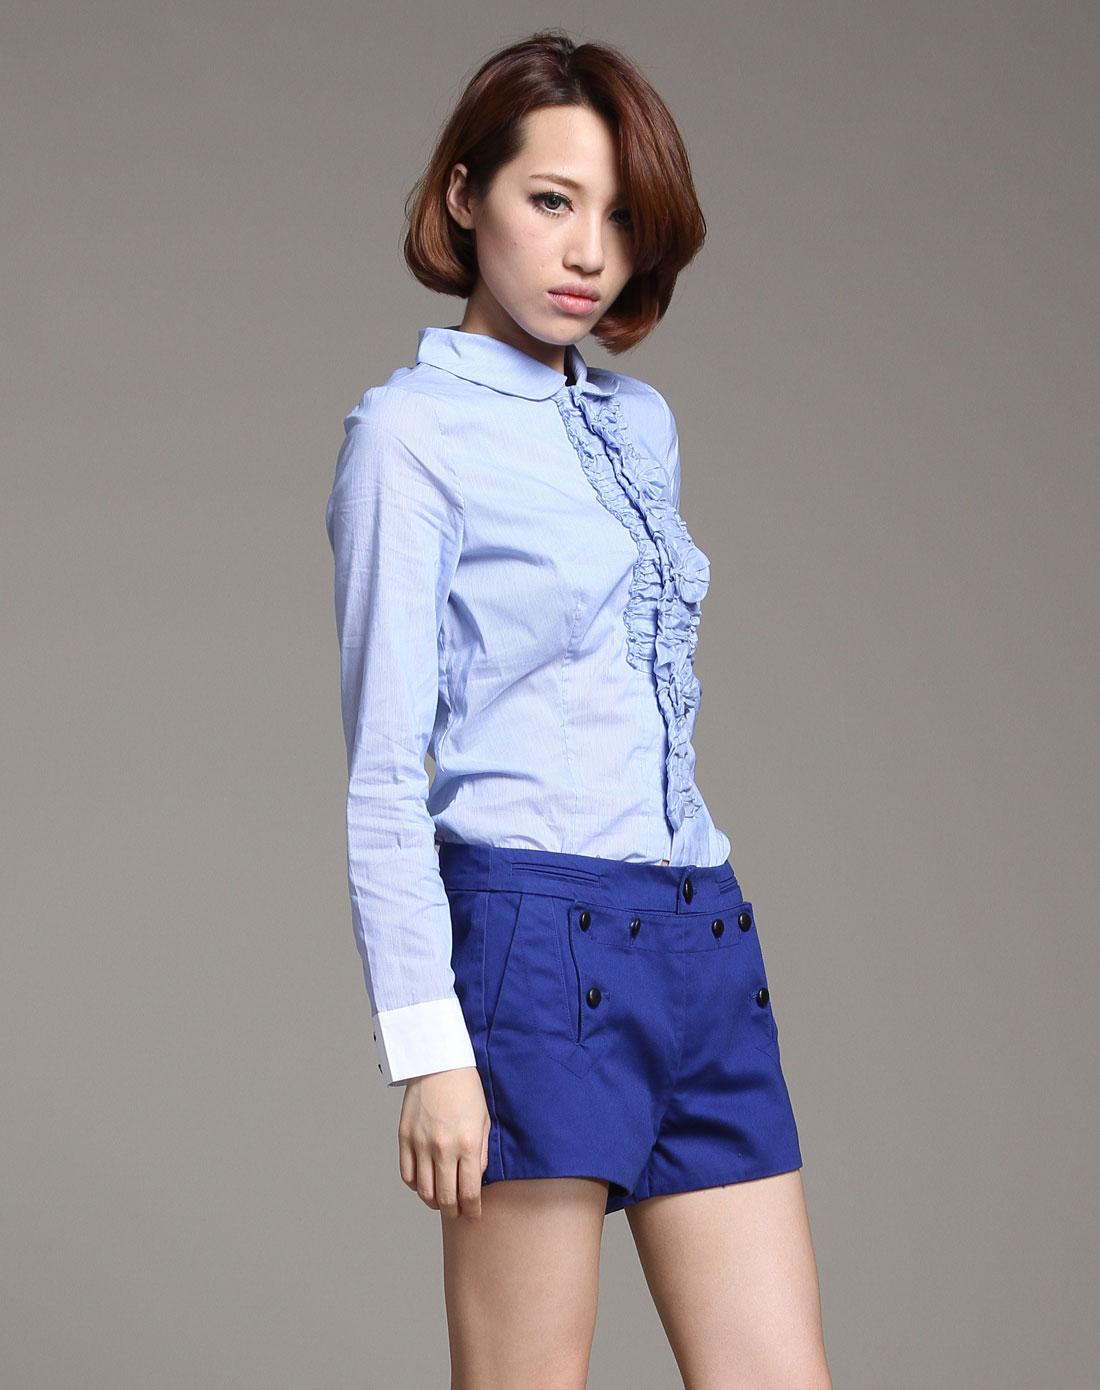 dazzle天蓝色花边淑女修身长袖衬衫211c41073